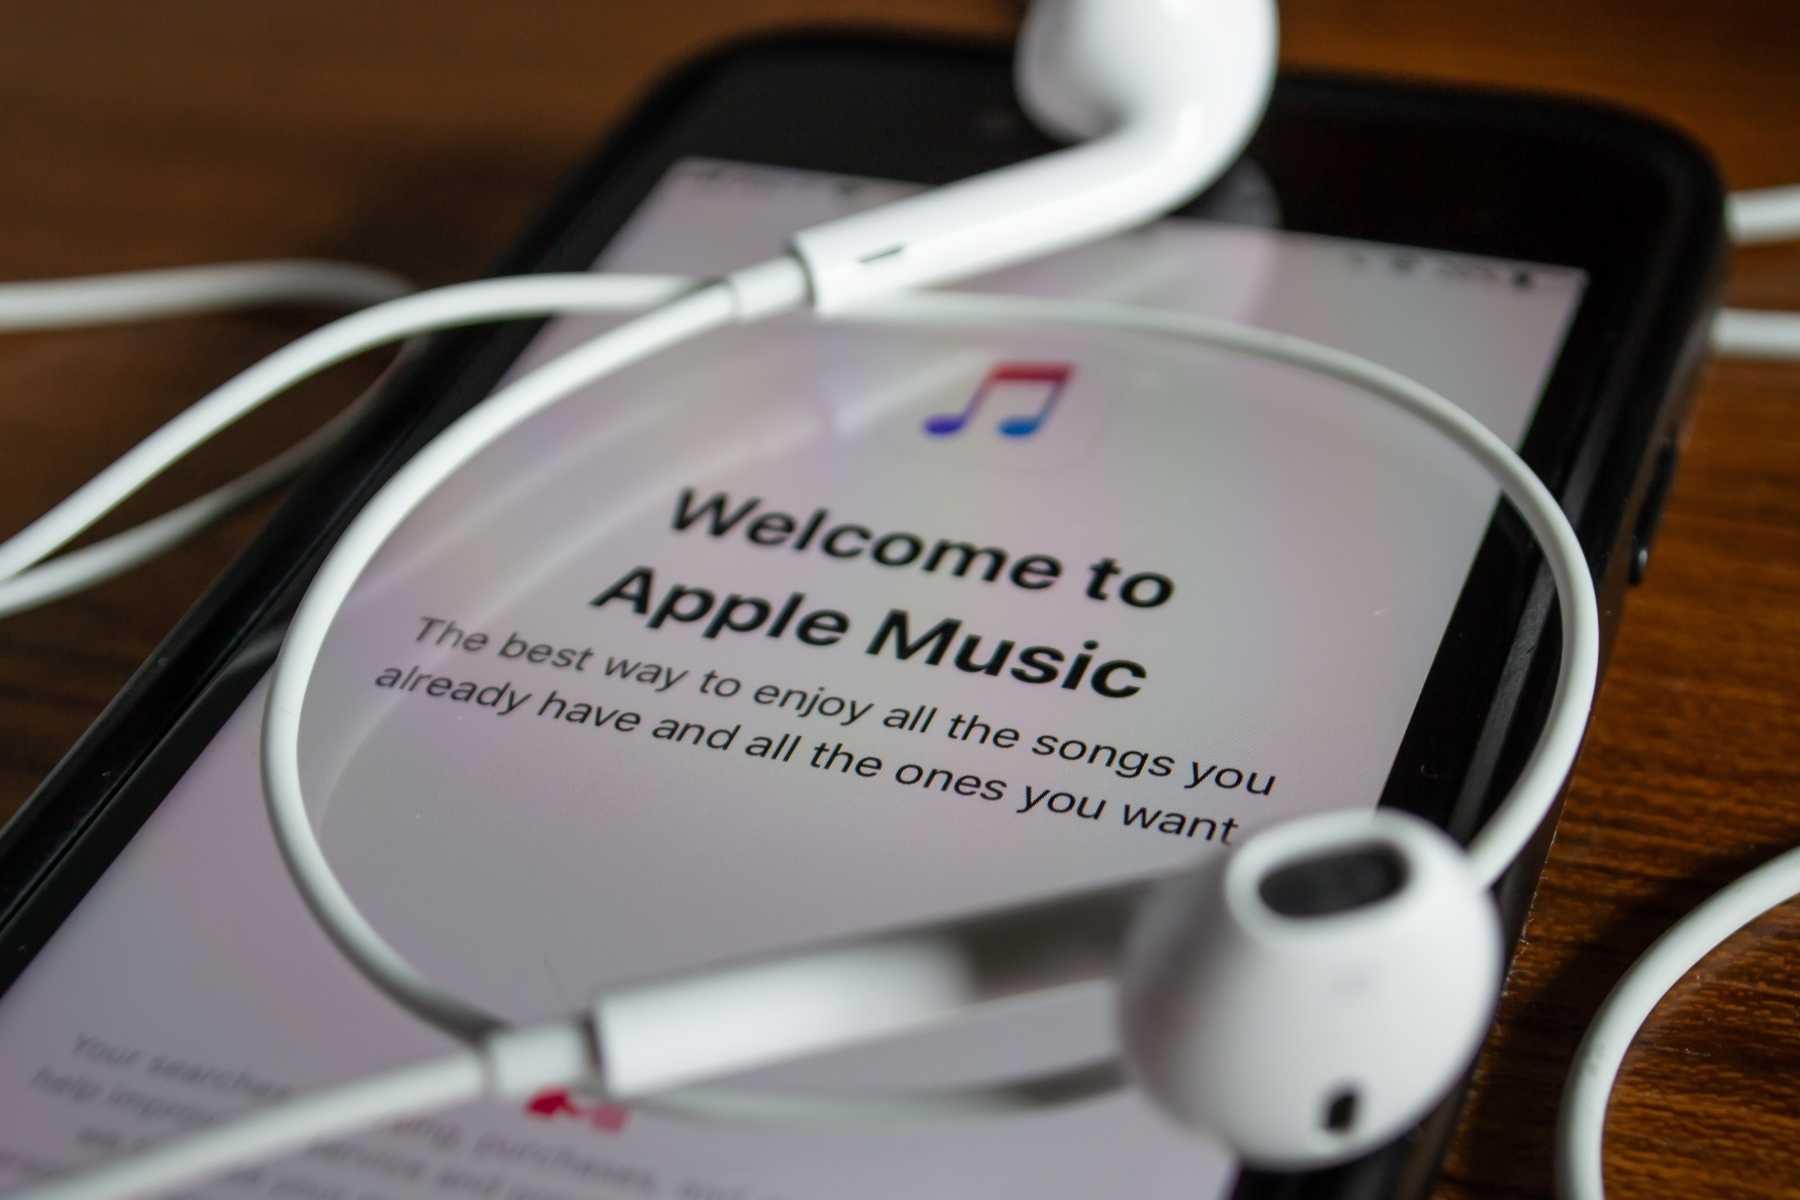 قابلیت جدید Apple Music